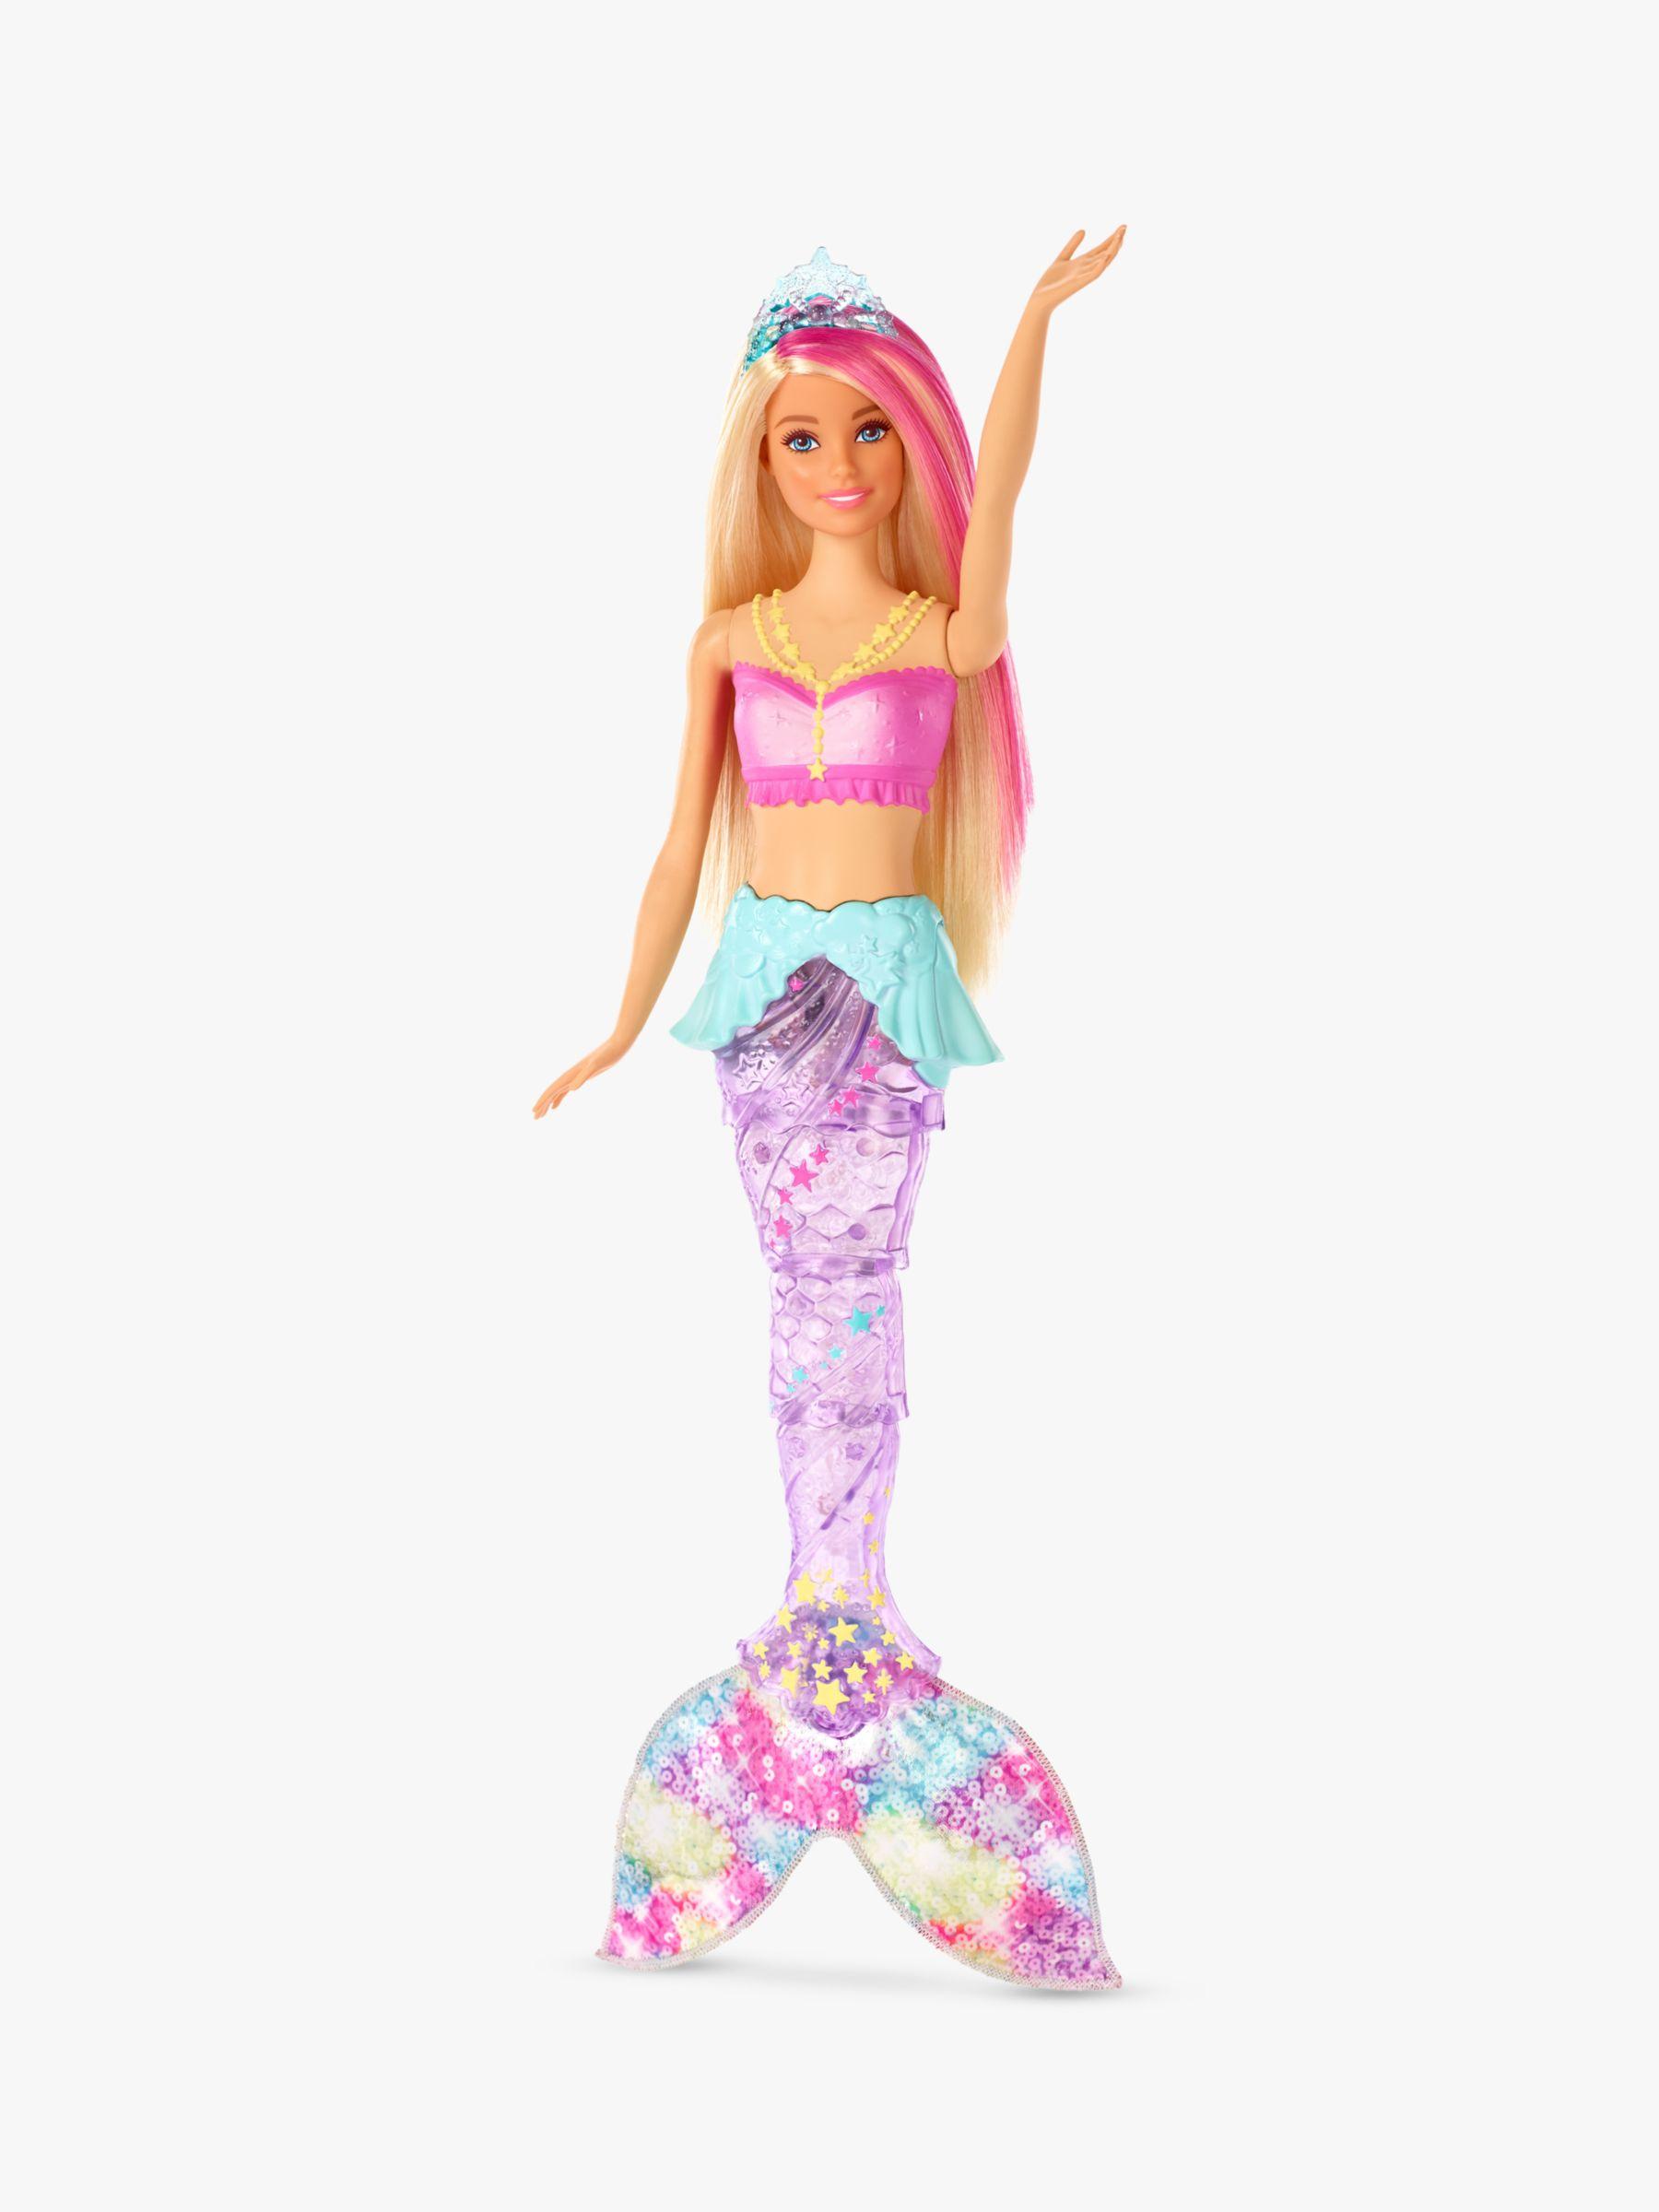 Barbie Barbie Dreamtopia Sparkle Lights Mermaid Doll